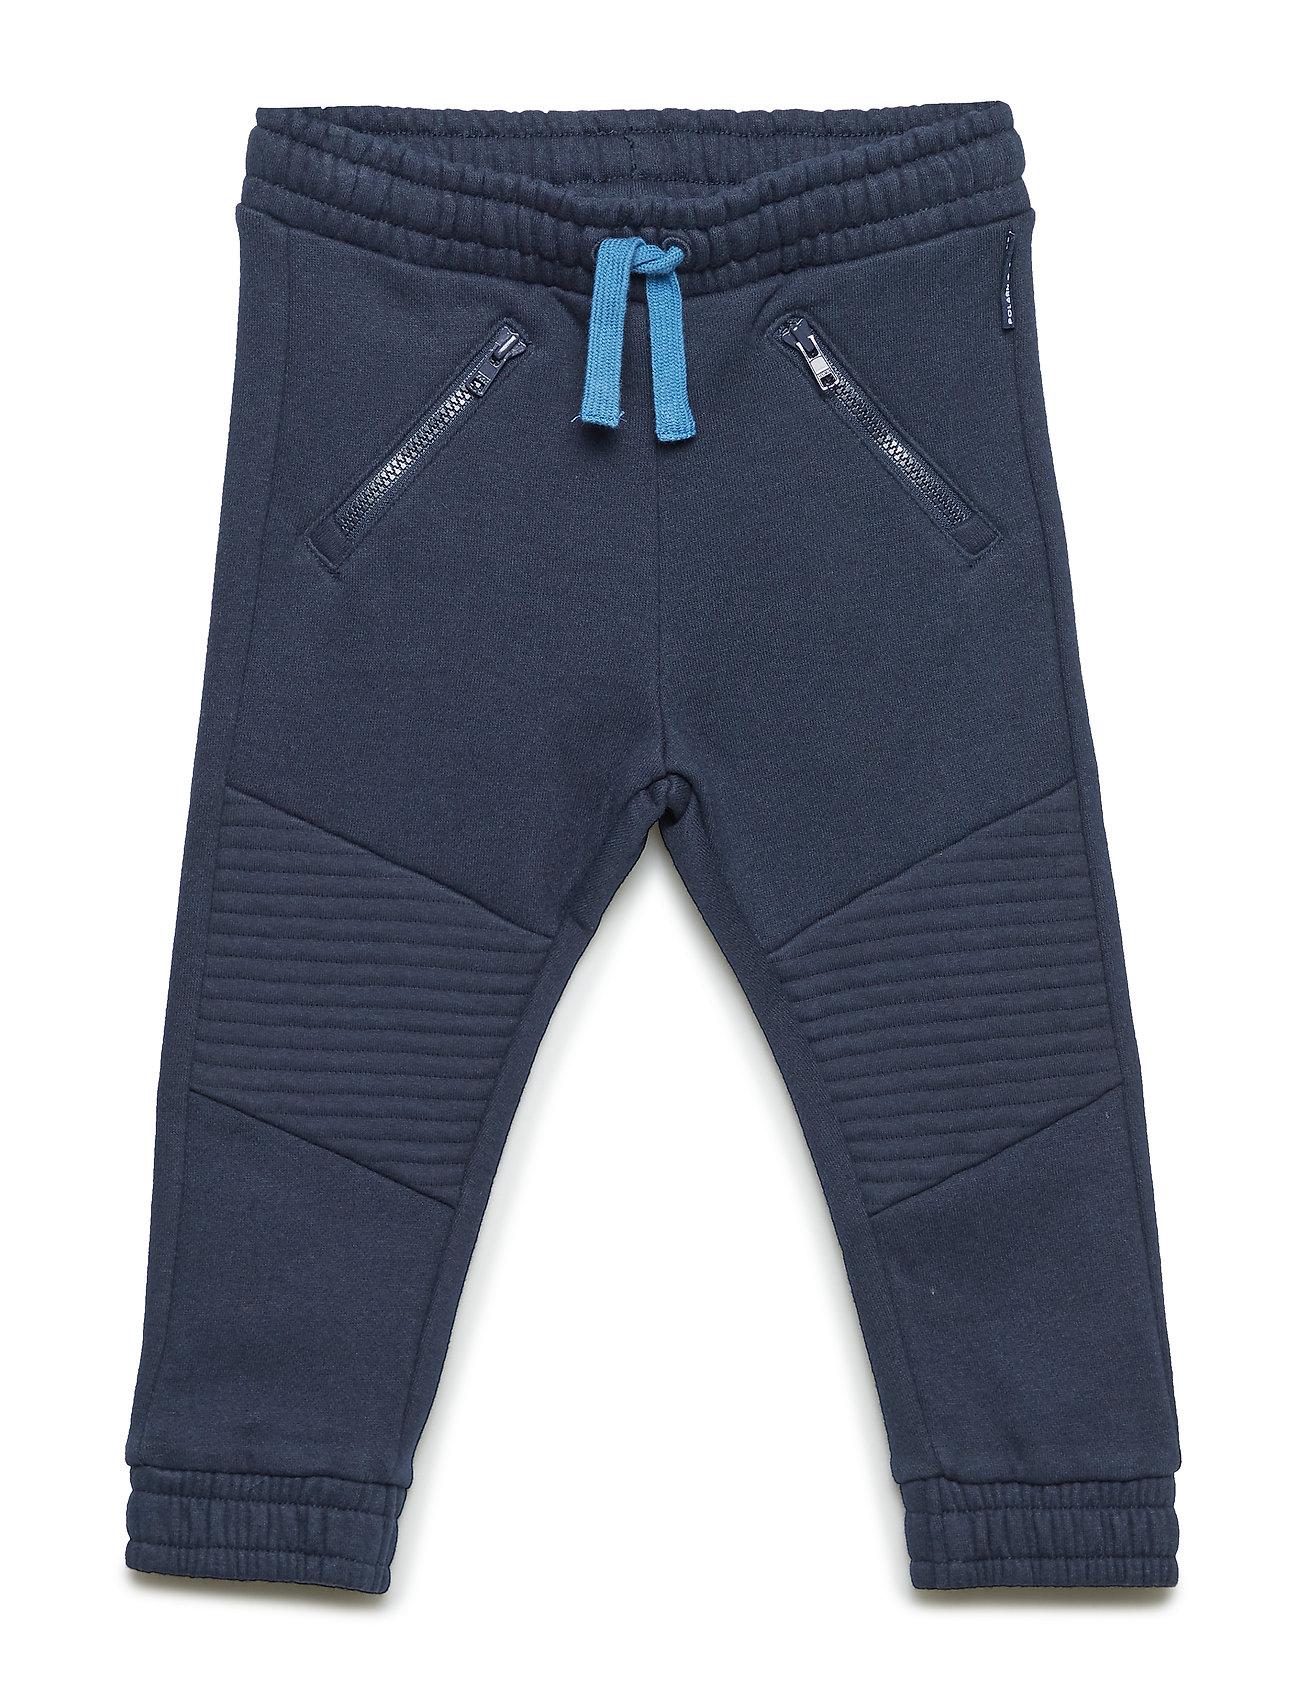 Image of Trouser Jersey Solid Preschool Sweatpants Hyggebukser Blå POLARN O. PYRET (3212175523)